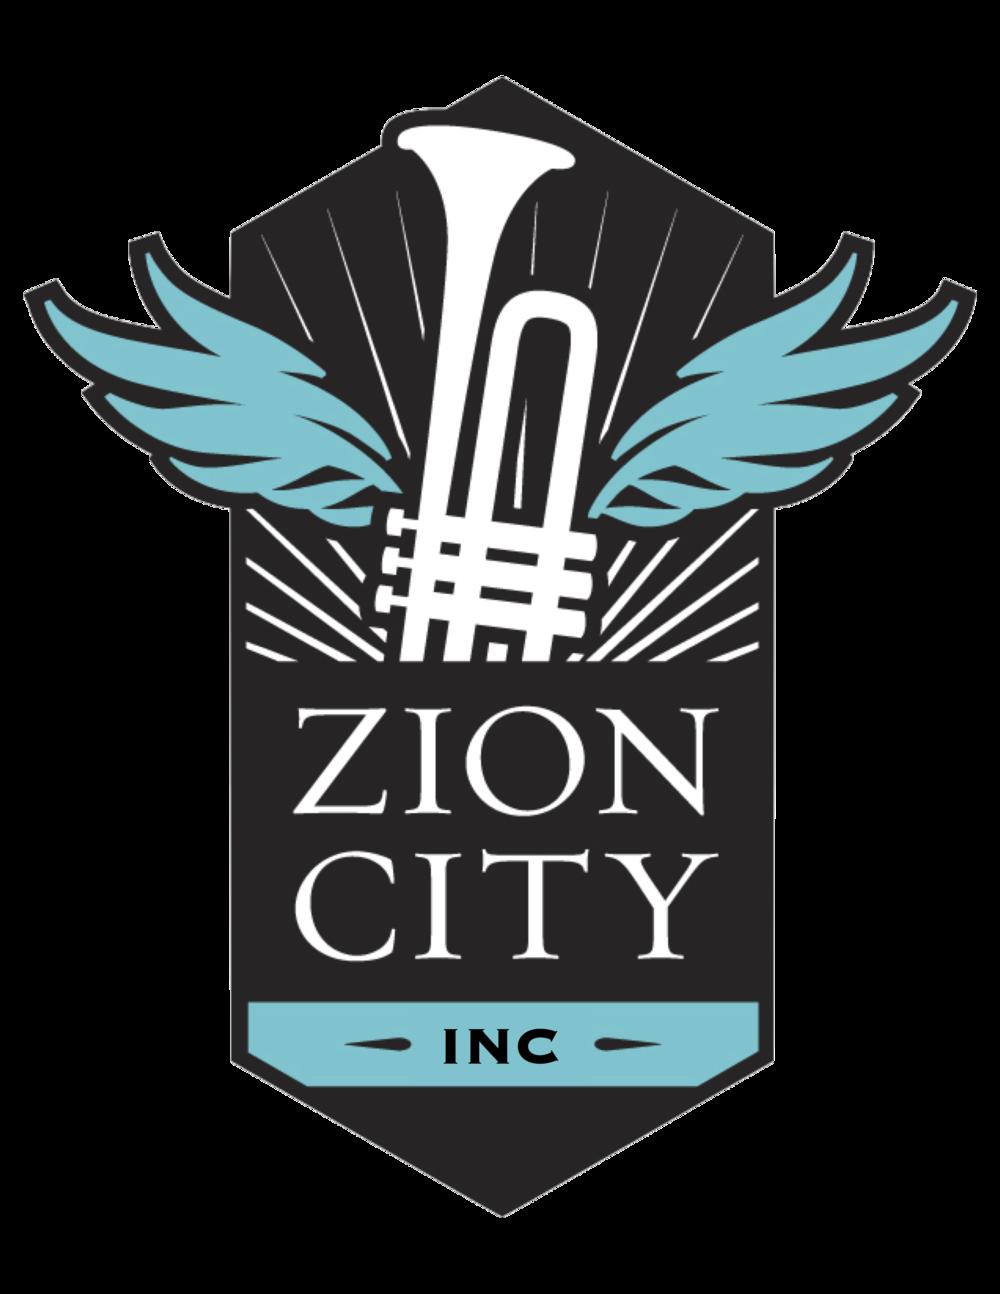 Zion City Inc JPG.png